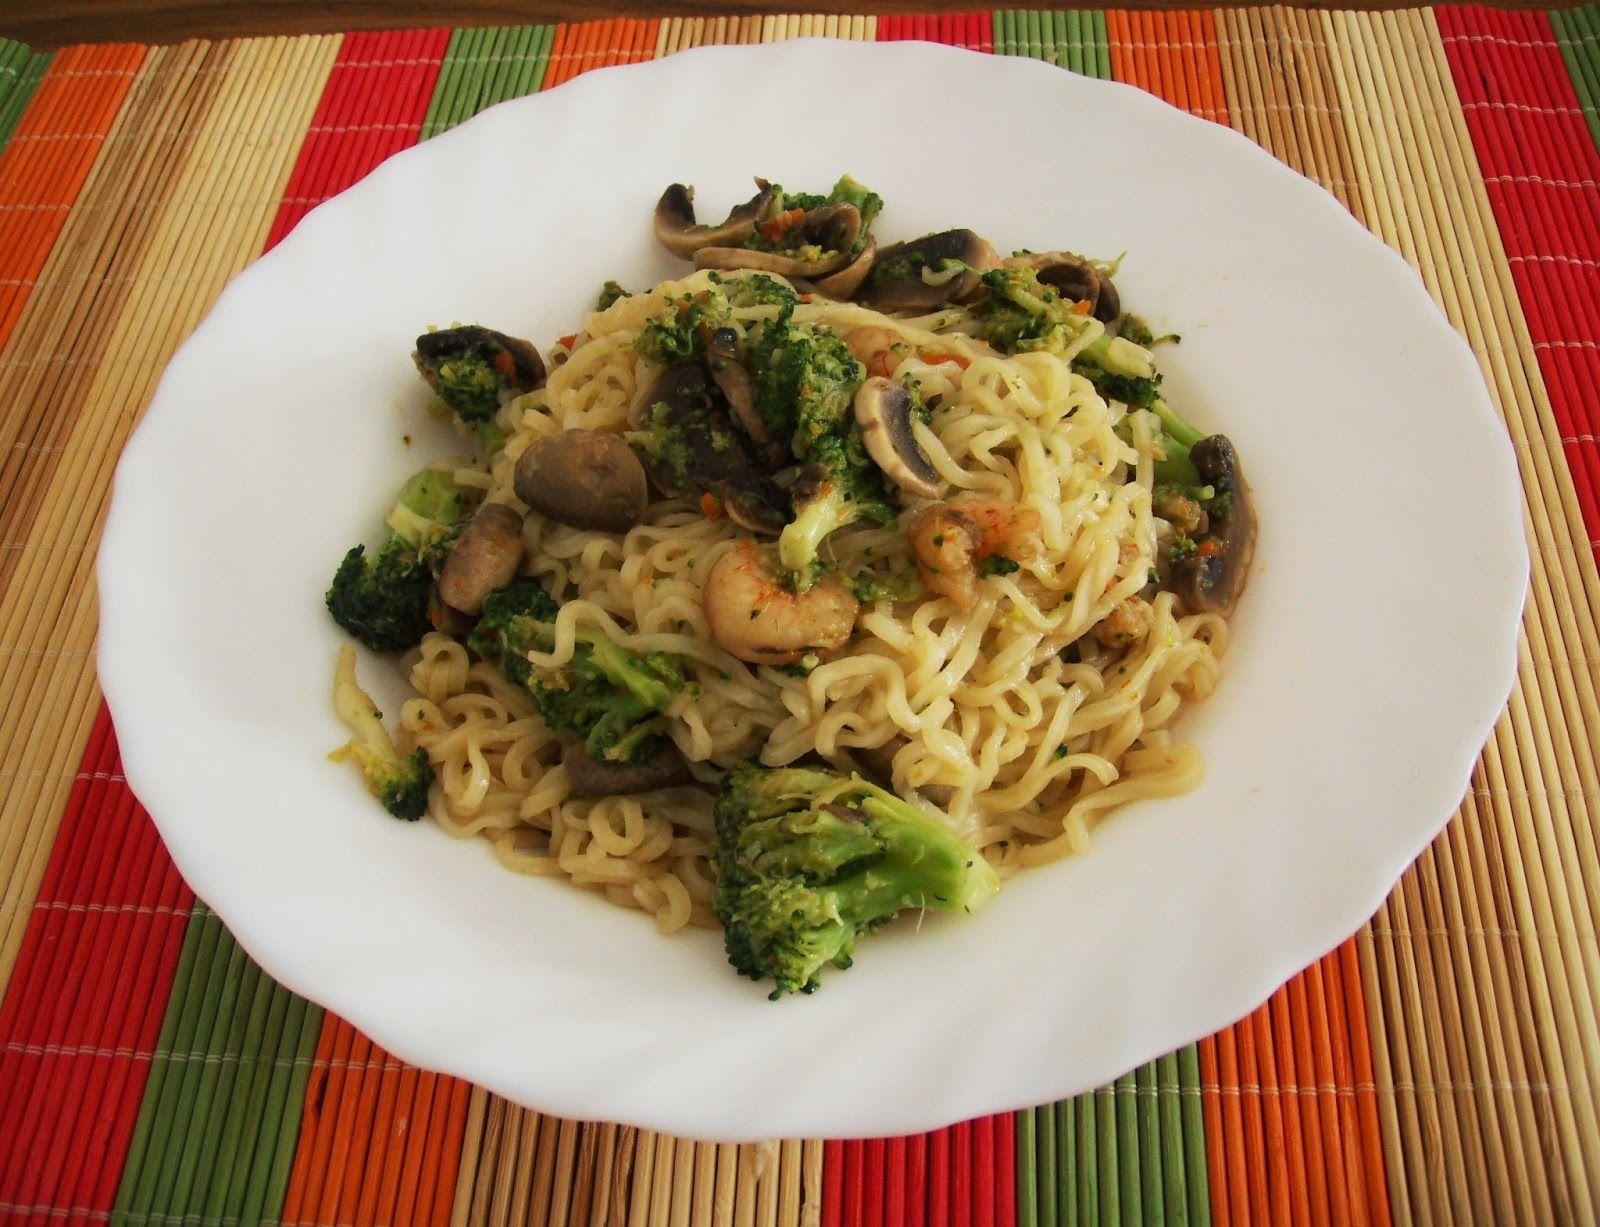 Fideos chinos fritos con brócoli, gambas y champiñones // Fried noodles with brocoli, mushrooms and prawns.